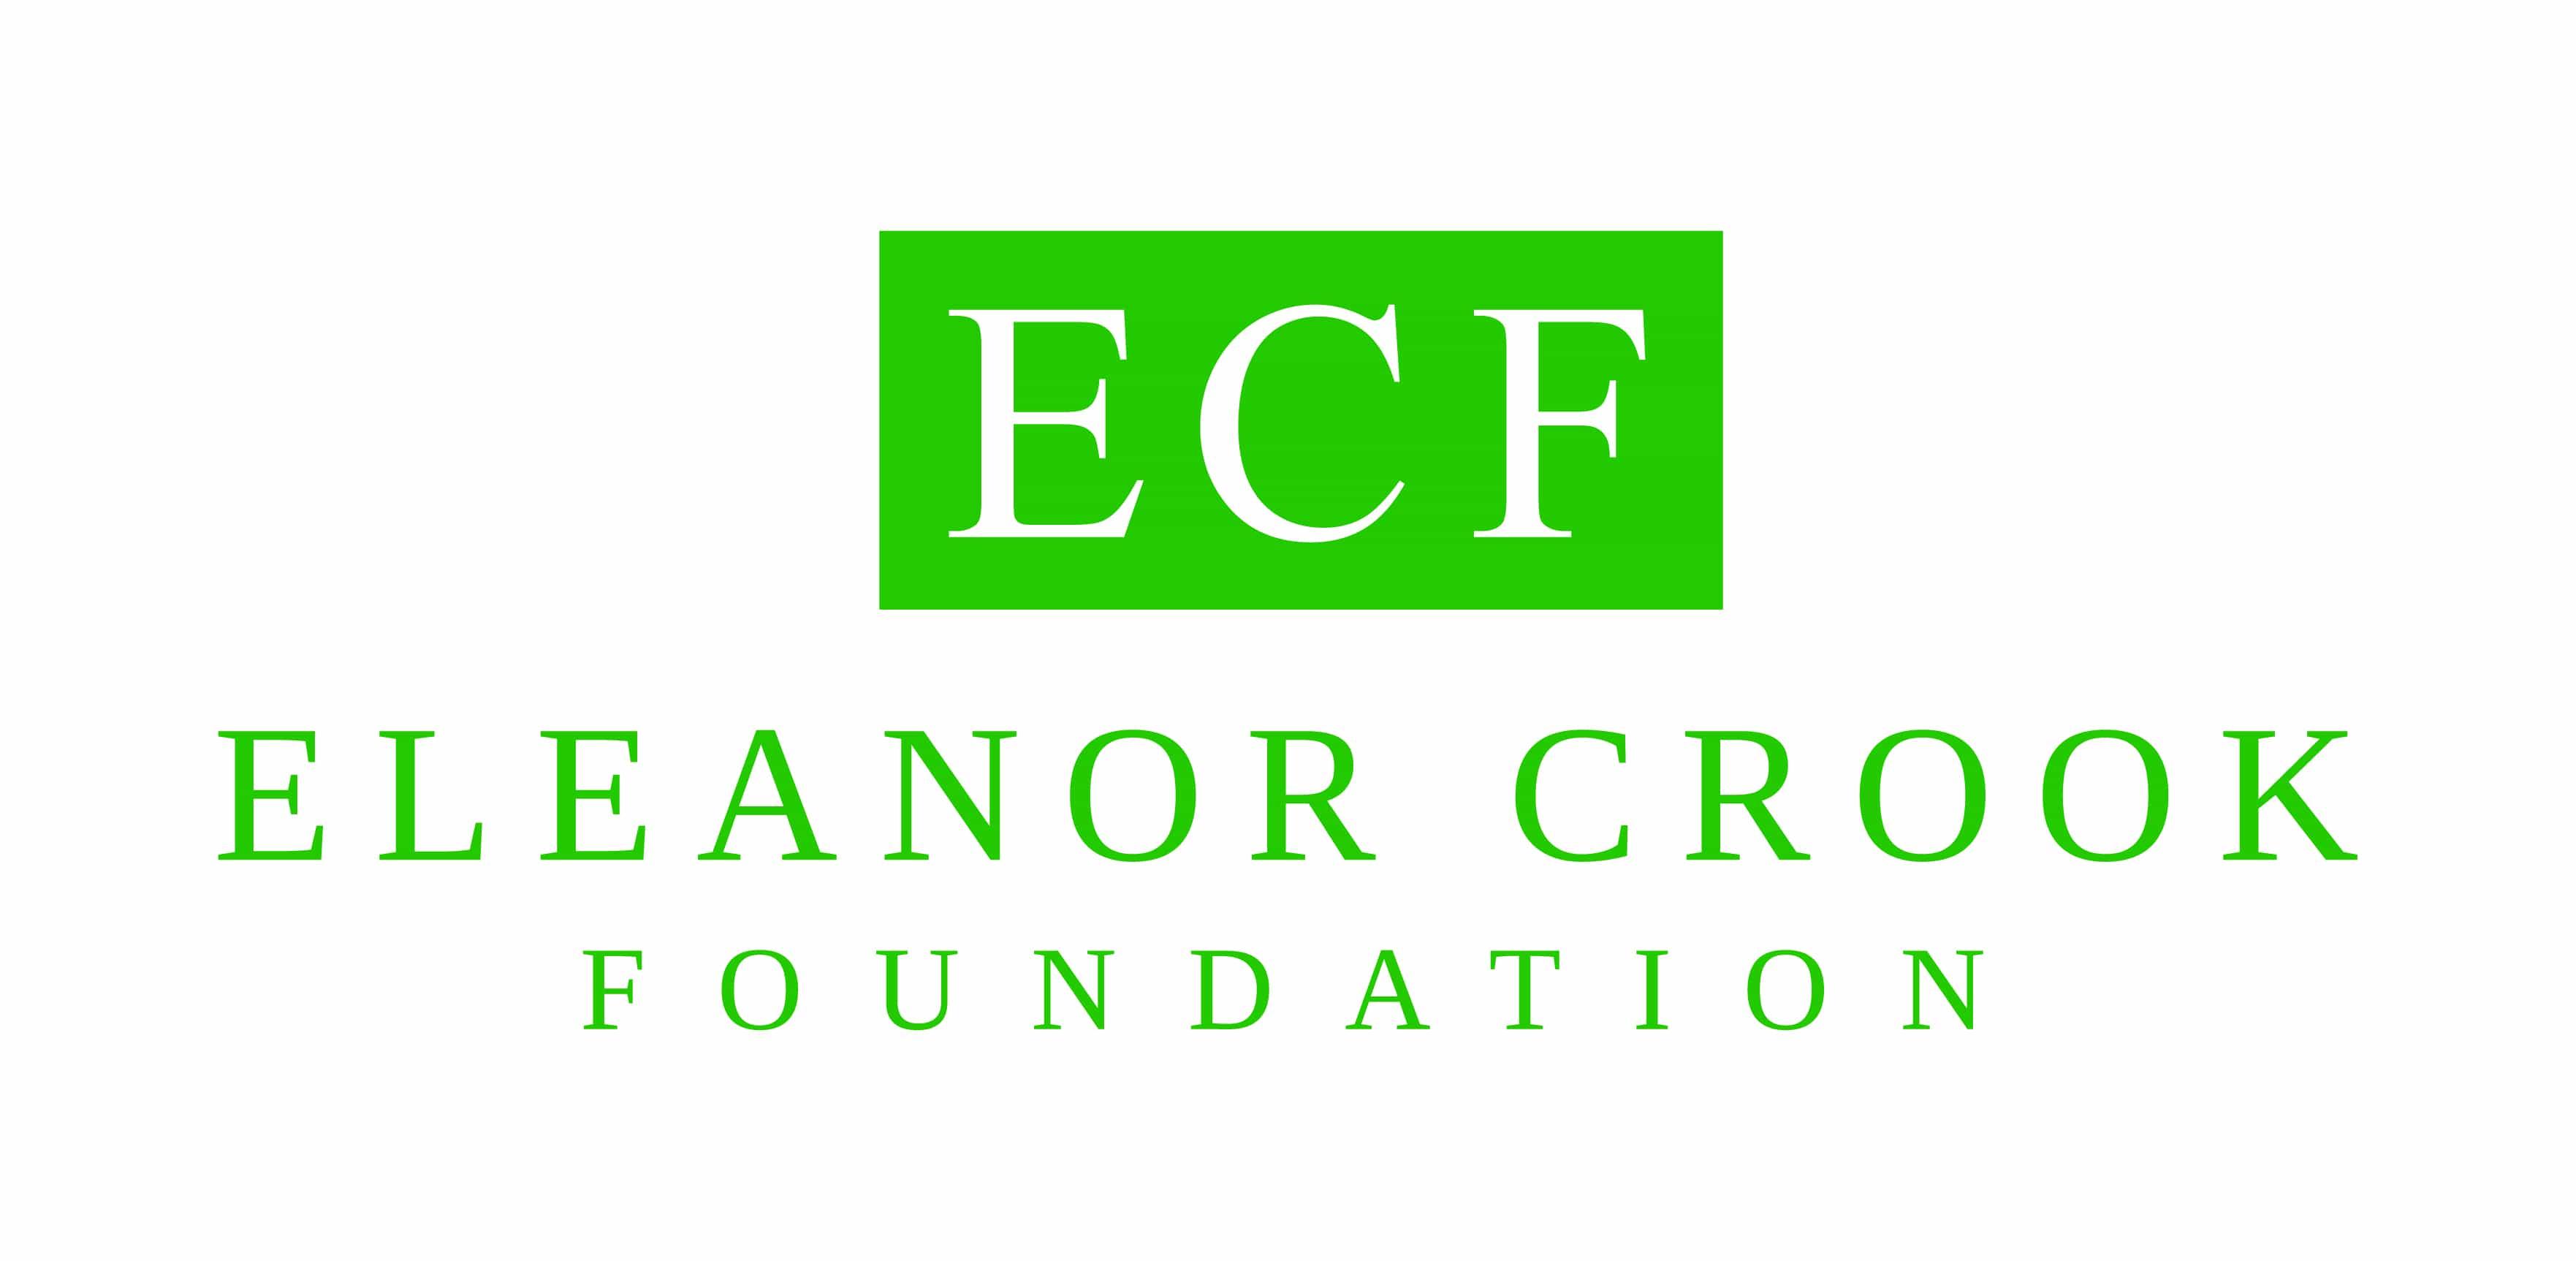 Eleanor Crook Foundation logo